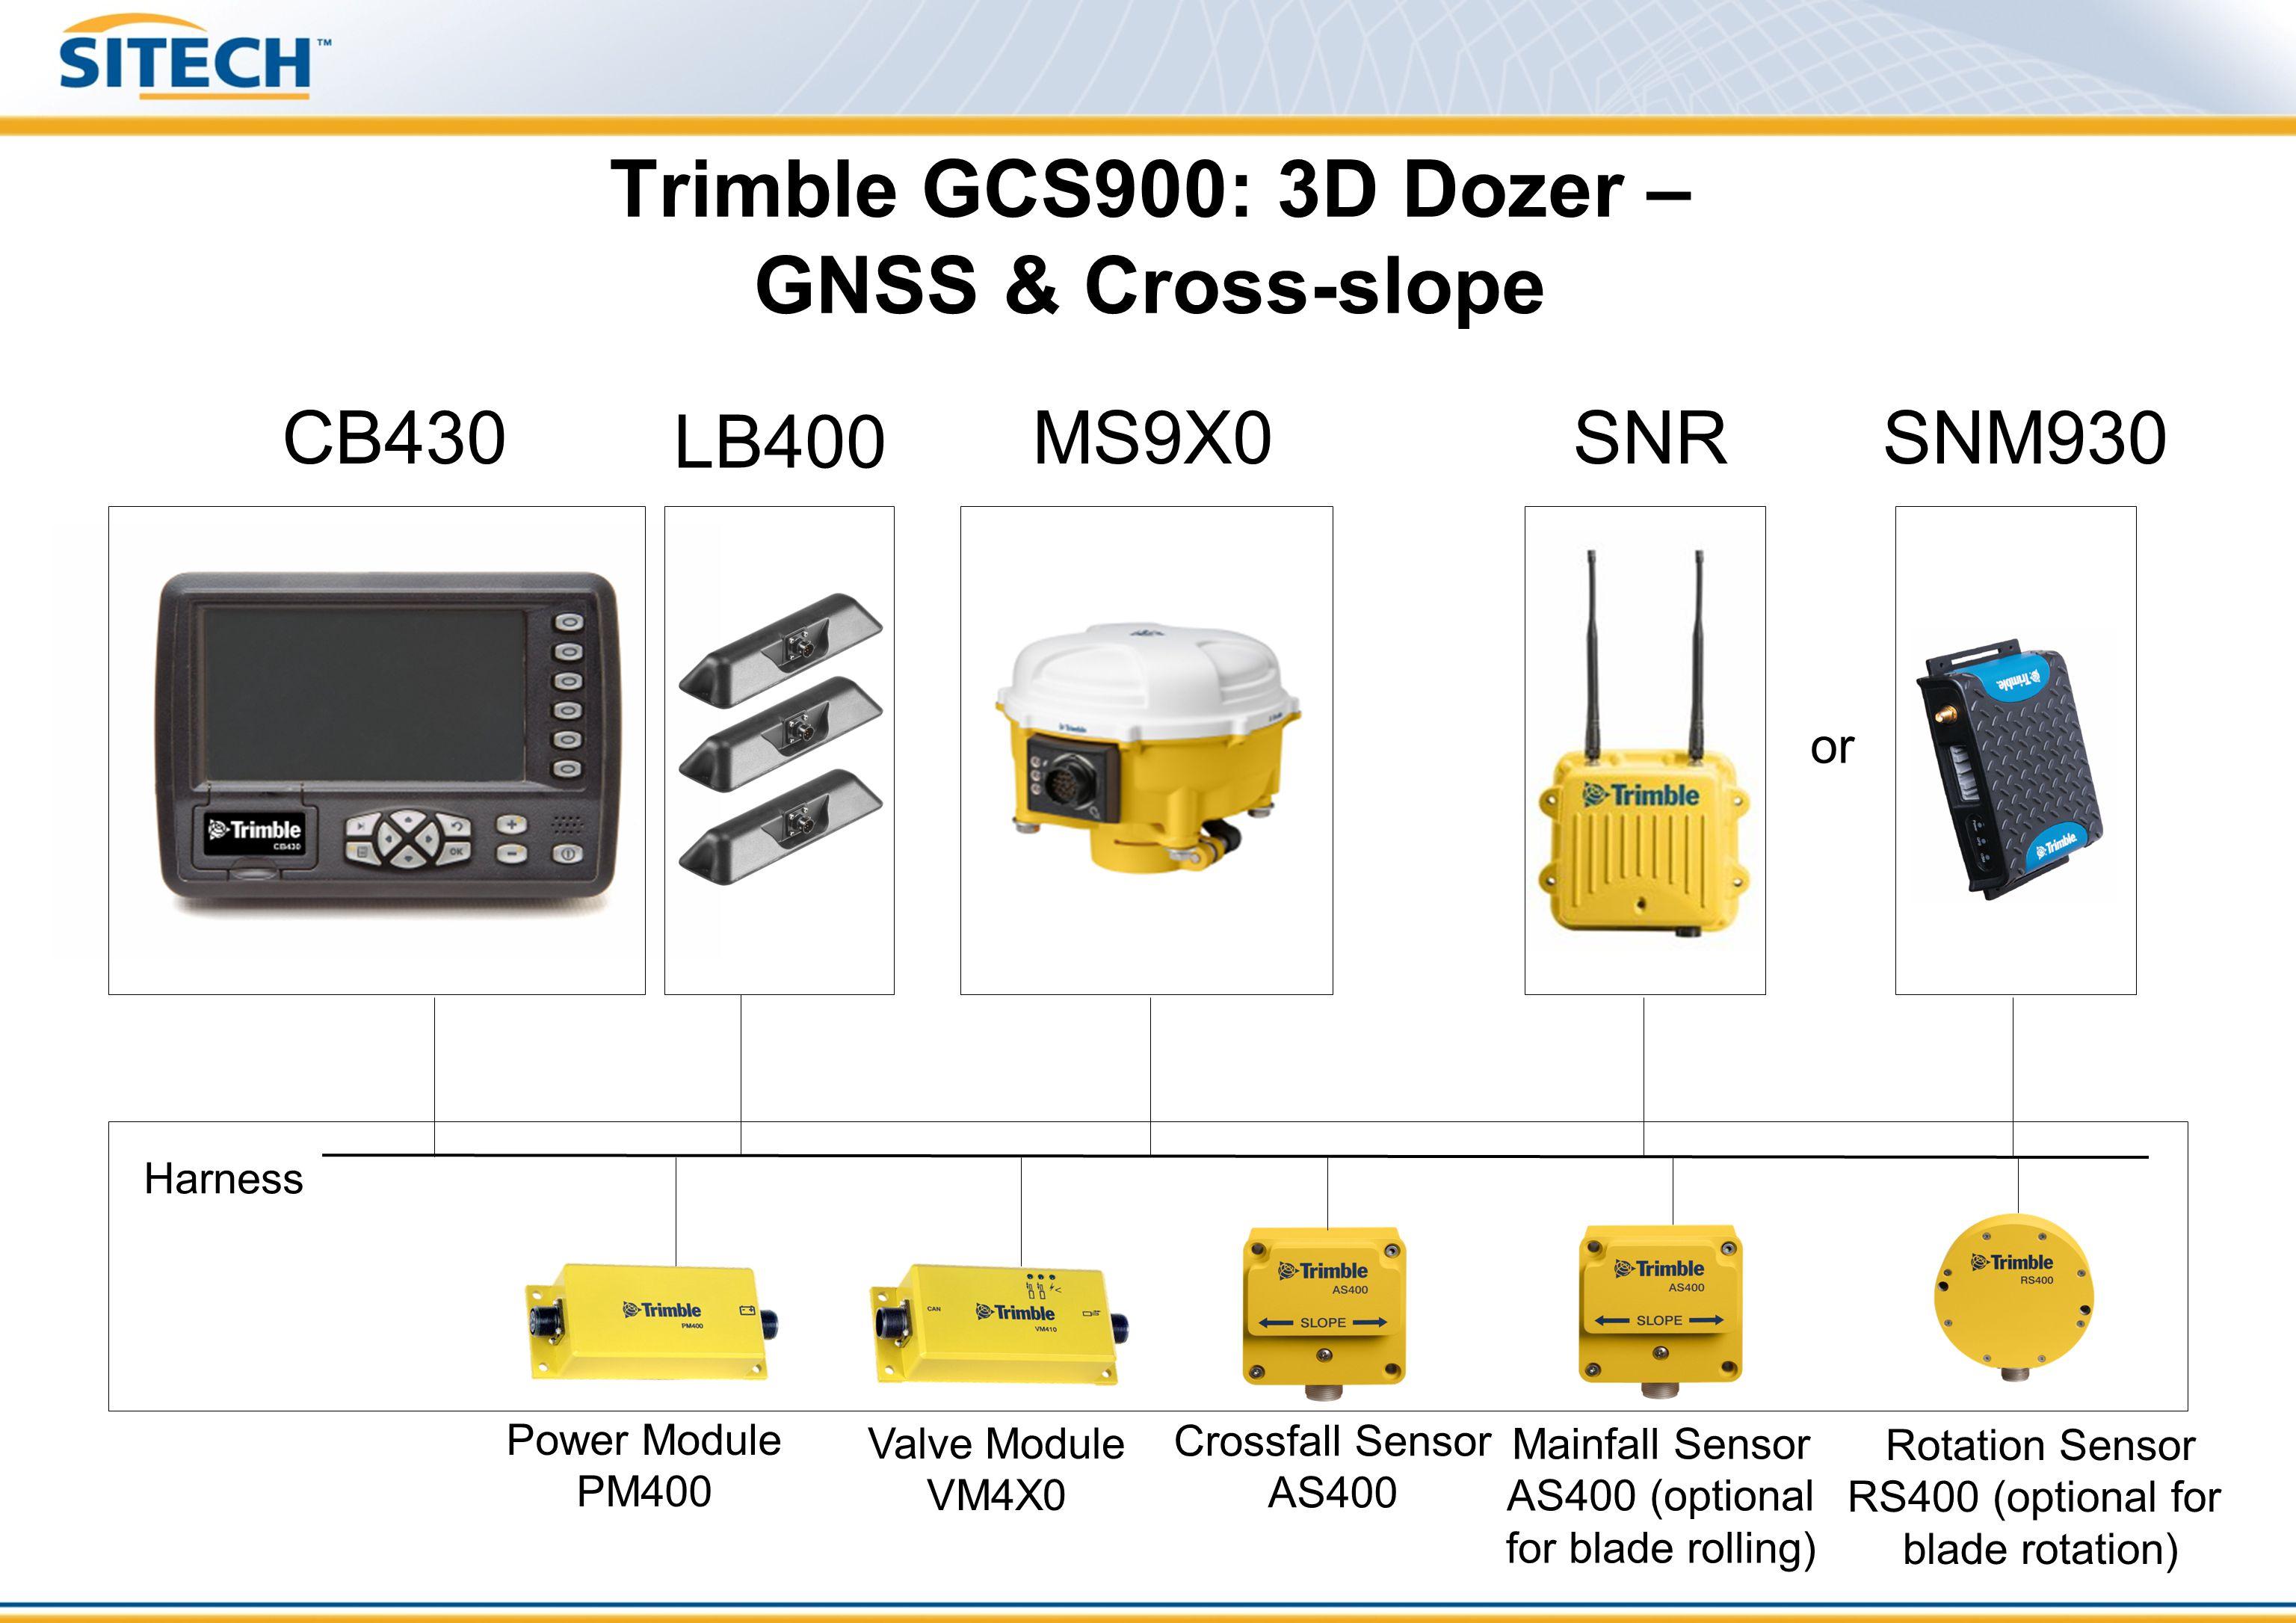 Trimble GCS900: 3D Dozer – Dual GNSS Harness Dual MS9X0 SNR Power Module PM400 Valve Module VM4X0 Mainfall Sensor AS400 (optional for blade rolling) CB430 LB400 SNM930 or